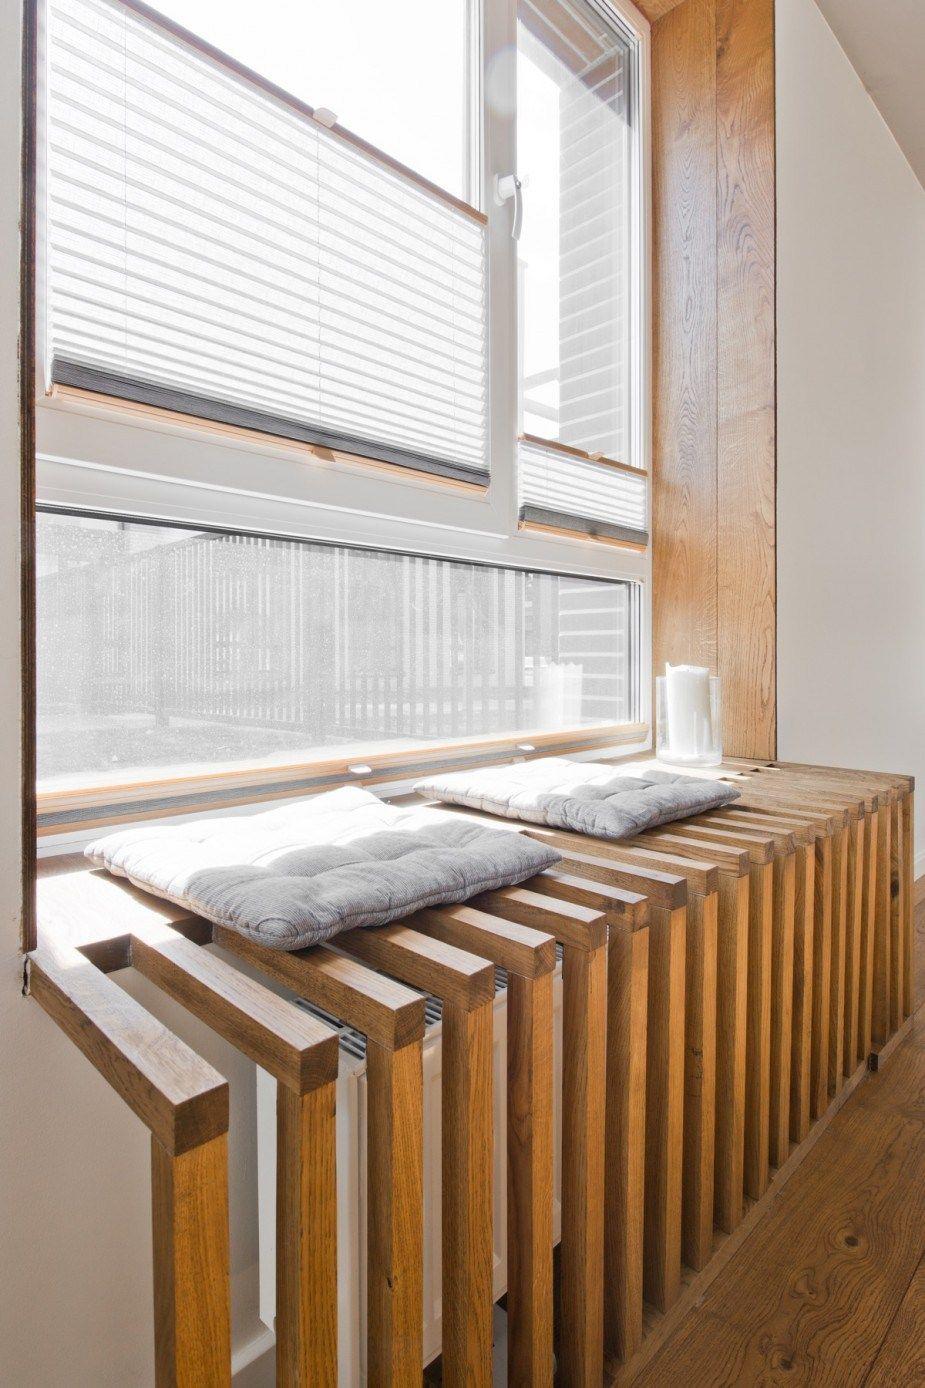 Open loft bedroom ideas  radiatordesignxg   Arredi e Home decor